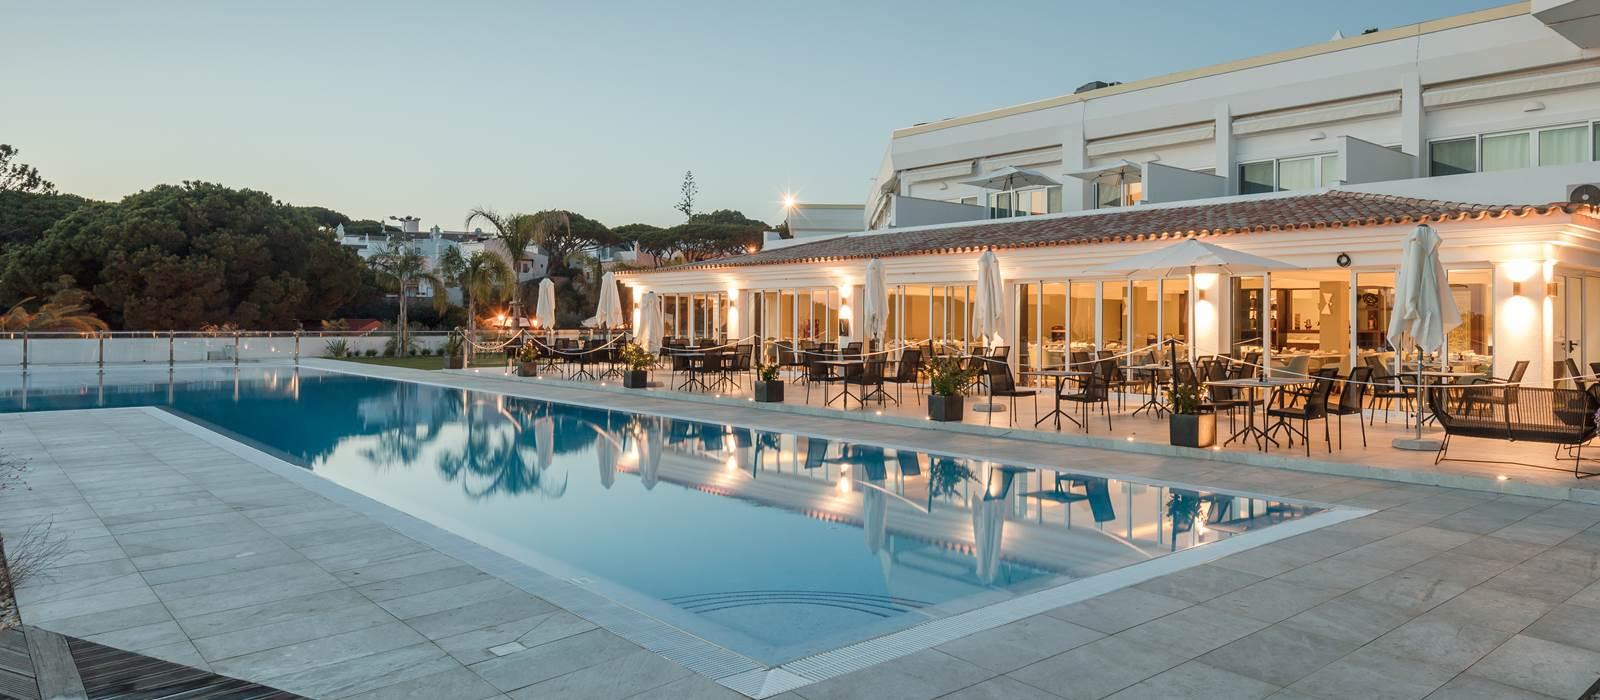 Heated Outdoor Pool Dona Filipa Hotel